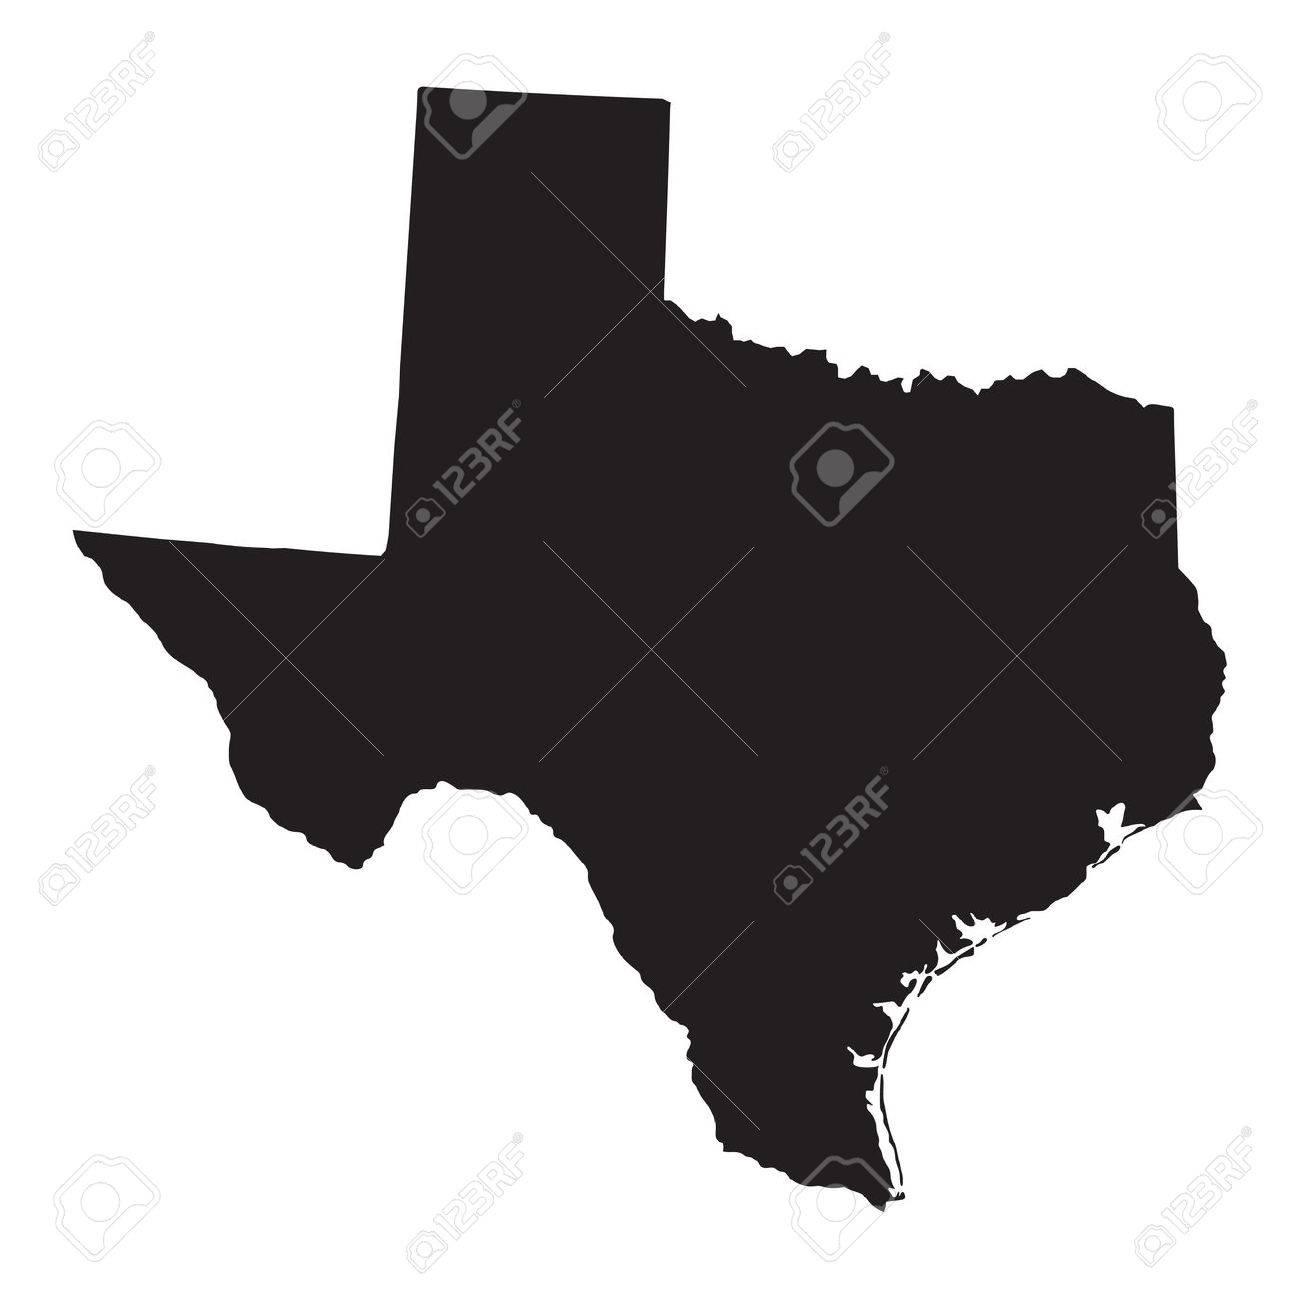 black map of Texas - 36292373